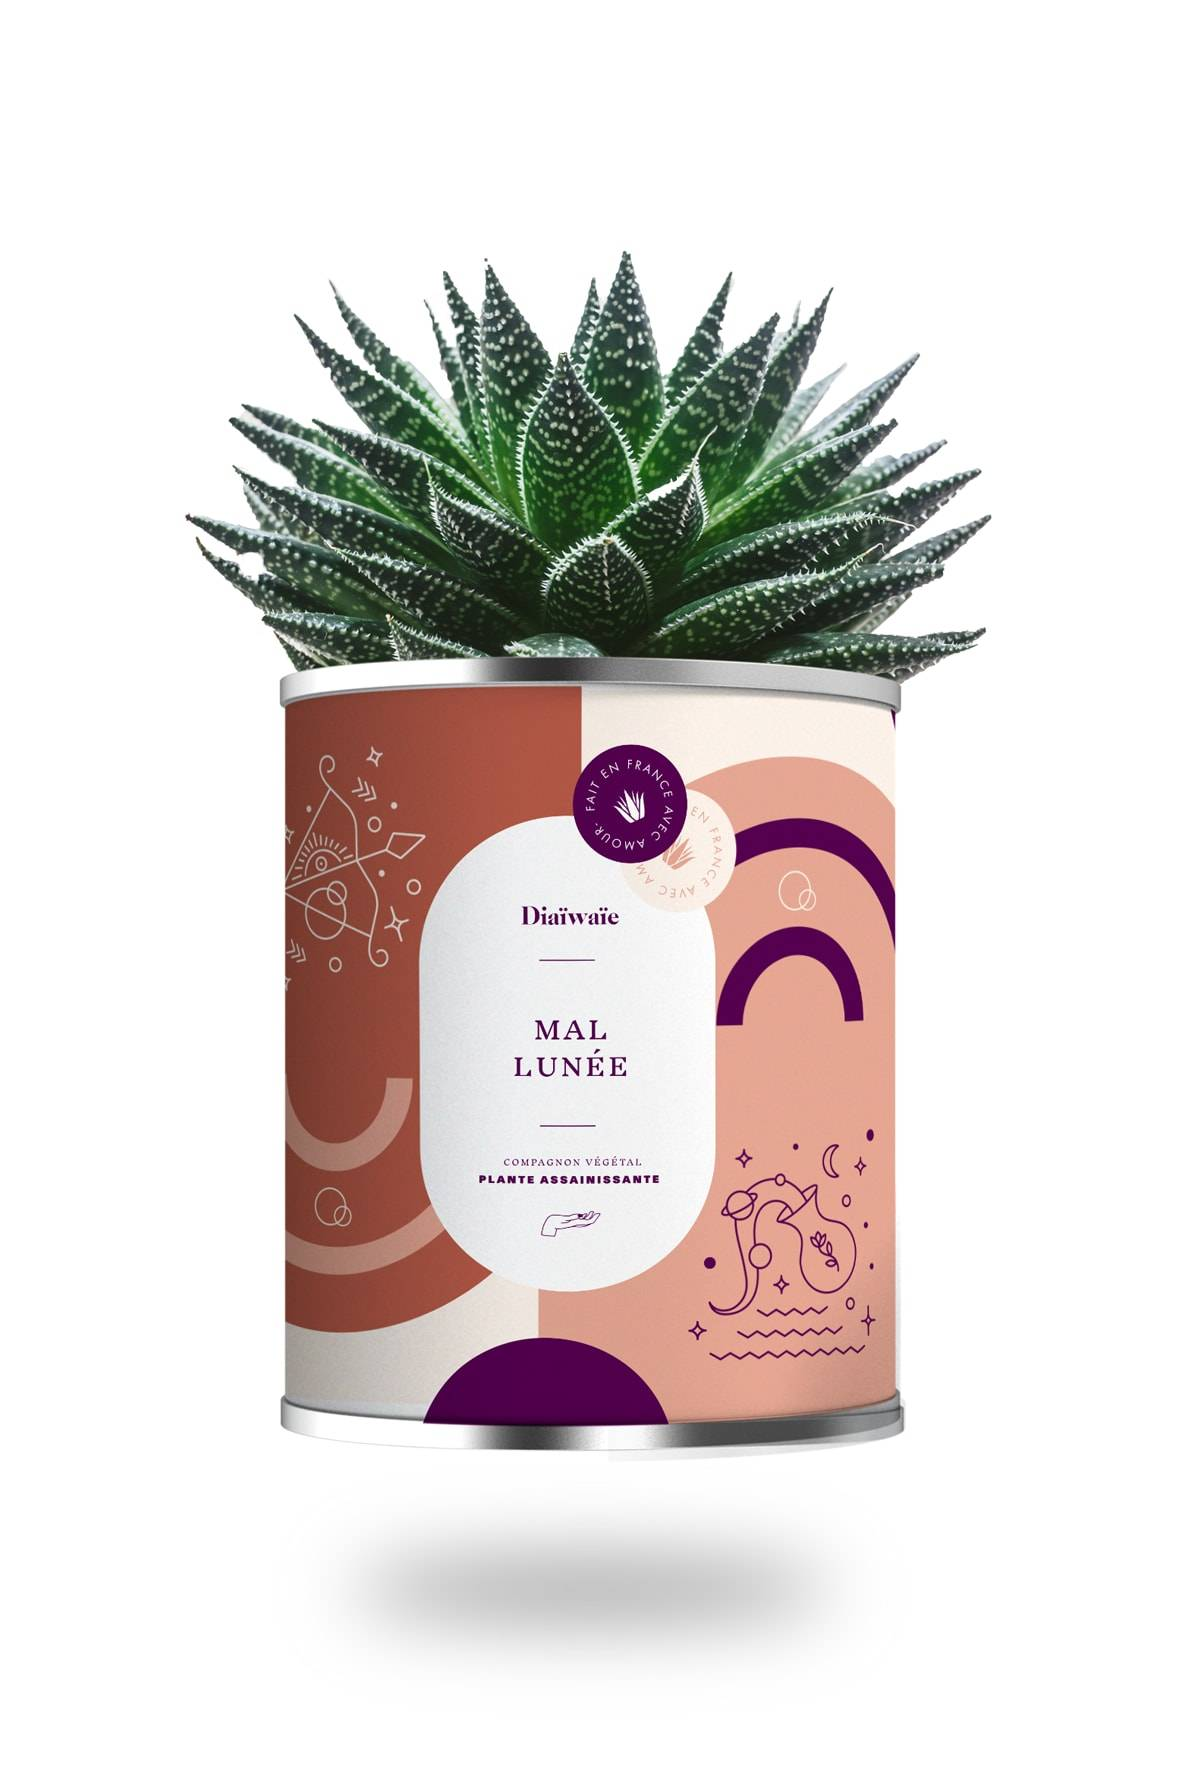 Diawae Cactus ou plante pot grand modle mal lunée